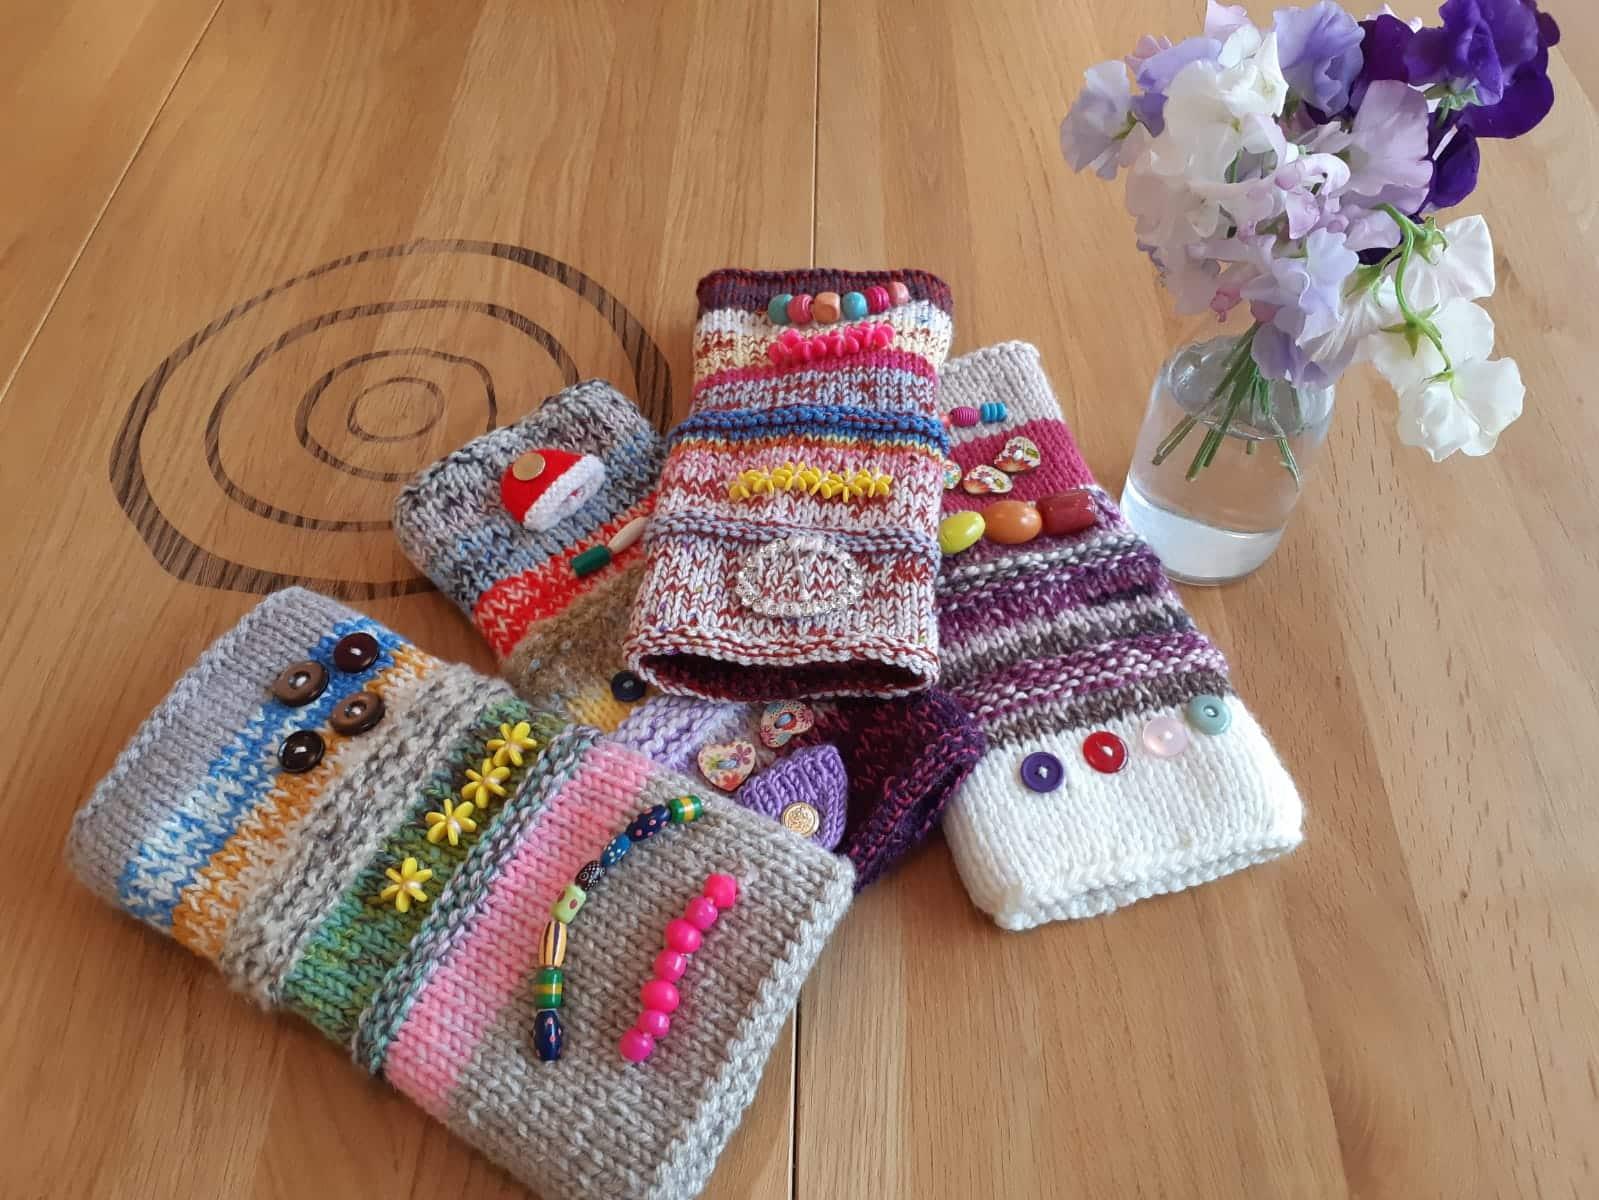 Full Circle Funeral knits